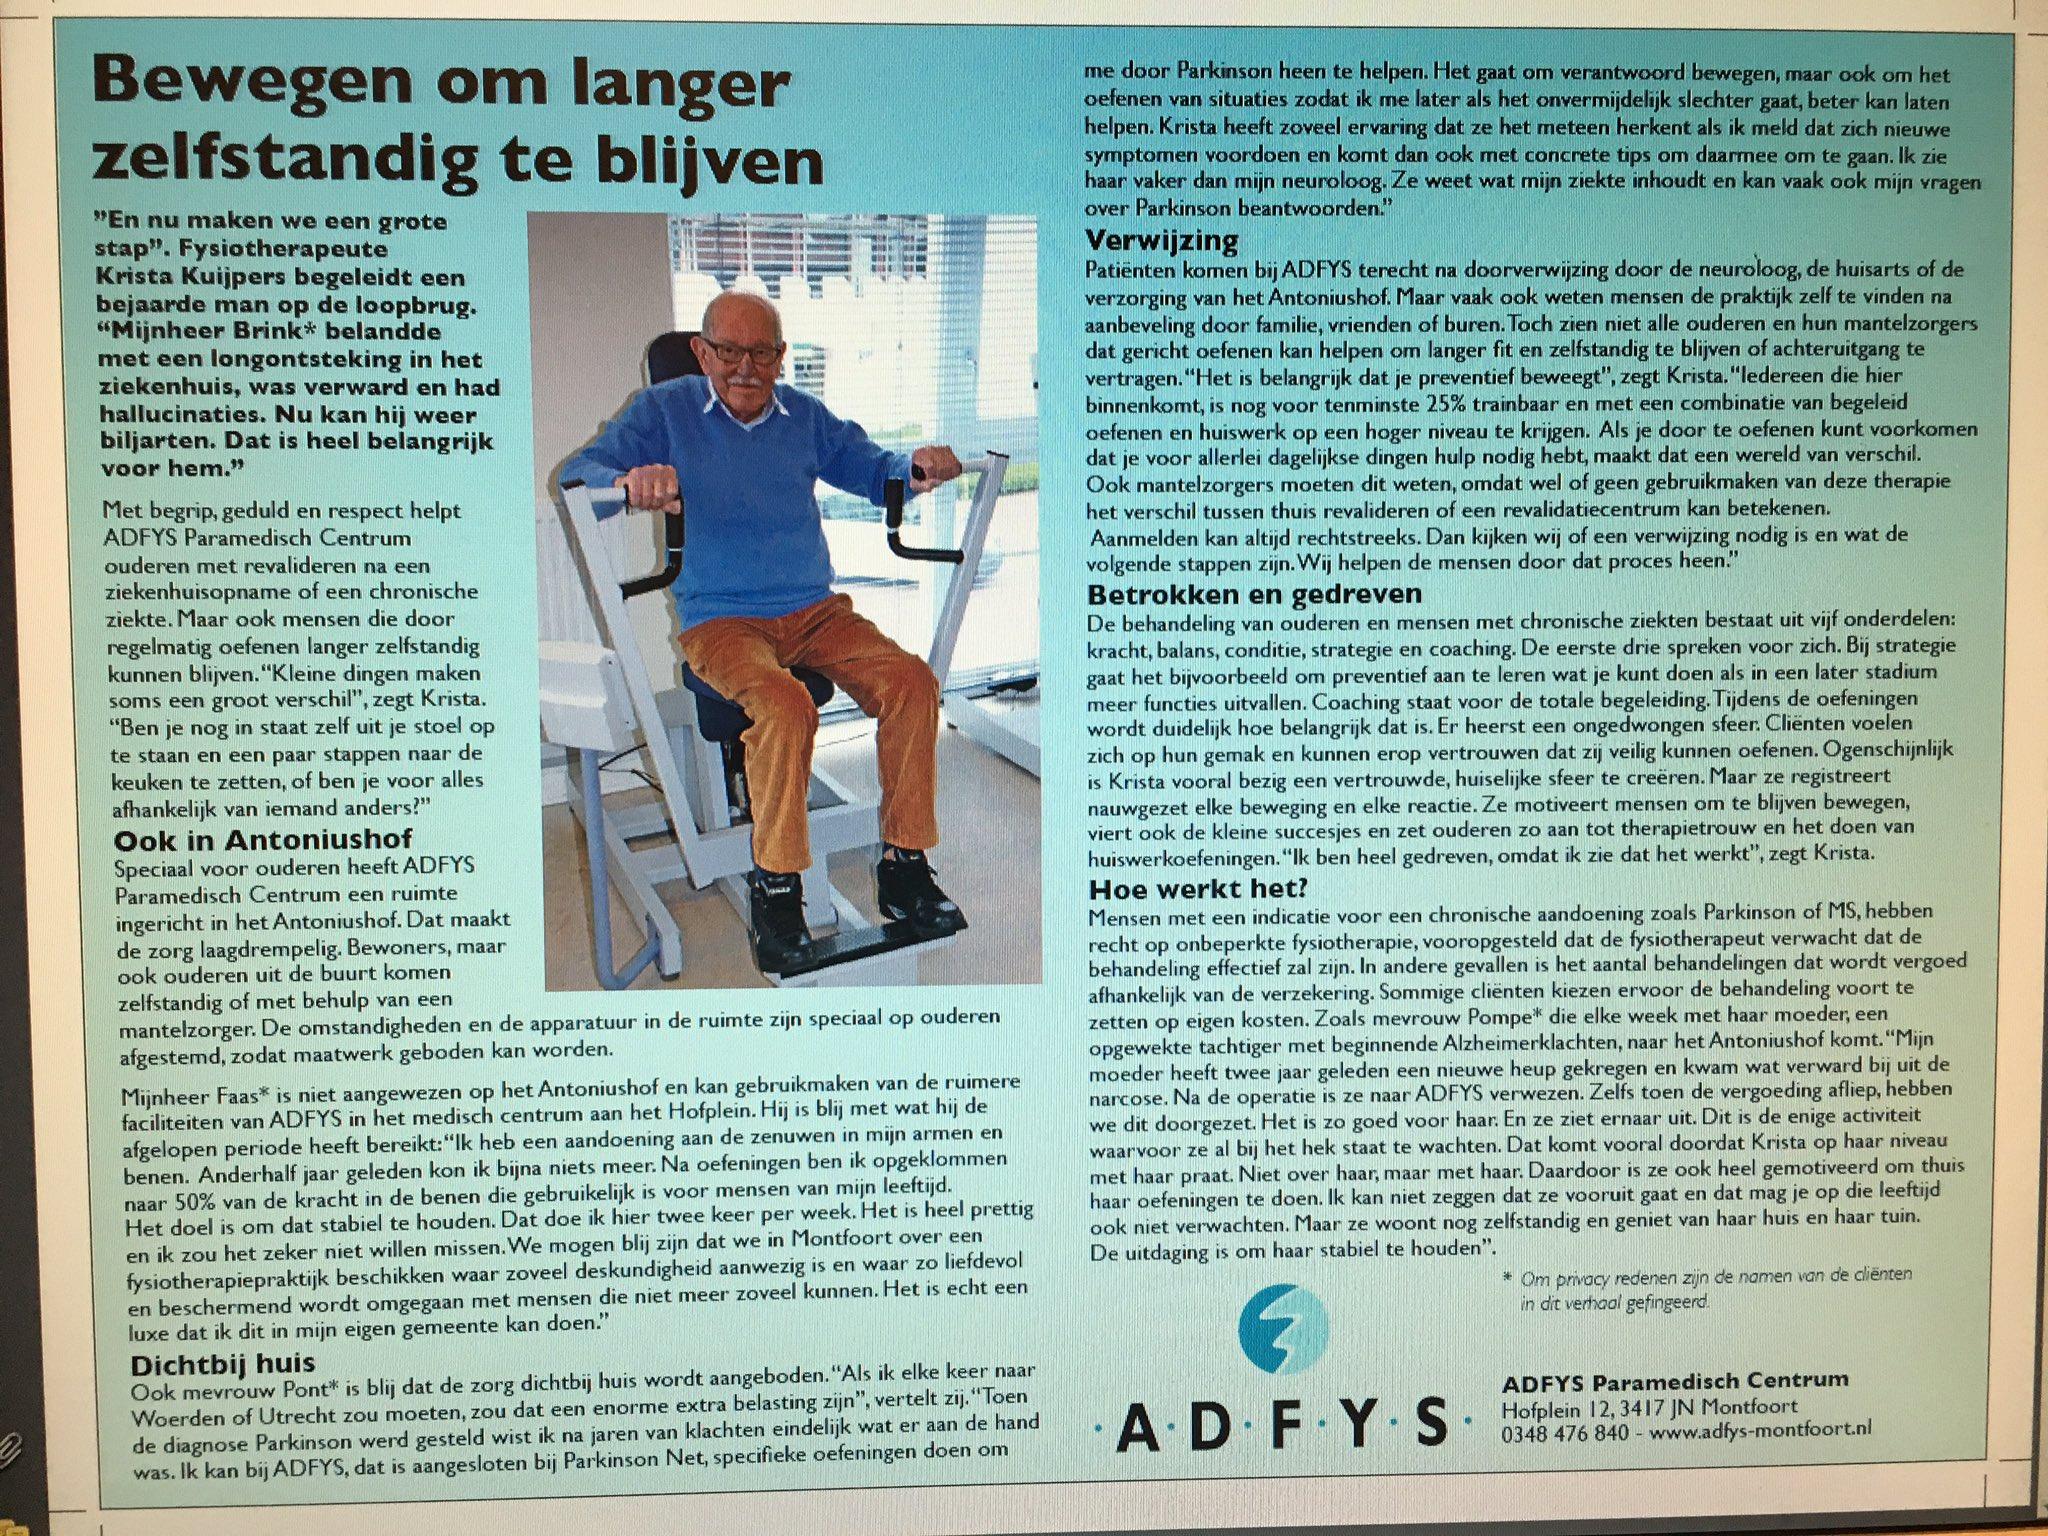 ADFYS Geriatrie Fysiotherapie , artikel in IJsselbode #app https://t.co/fNSSA8czdw